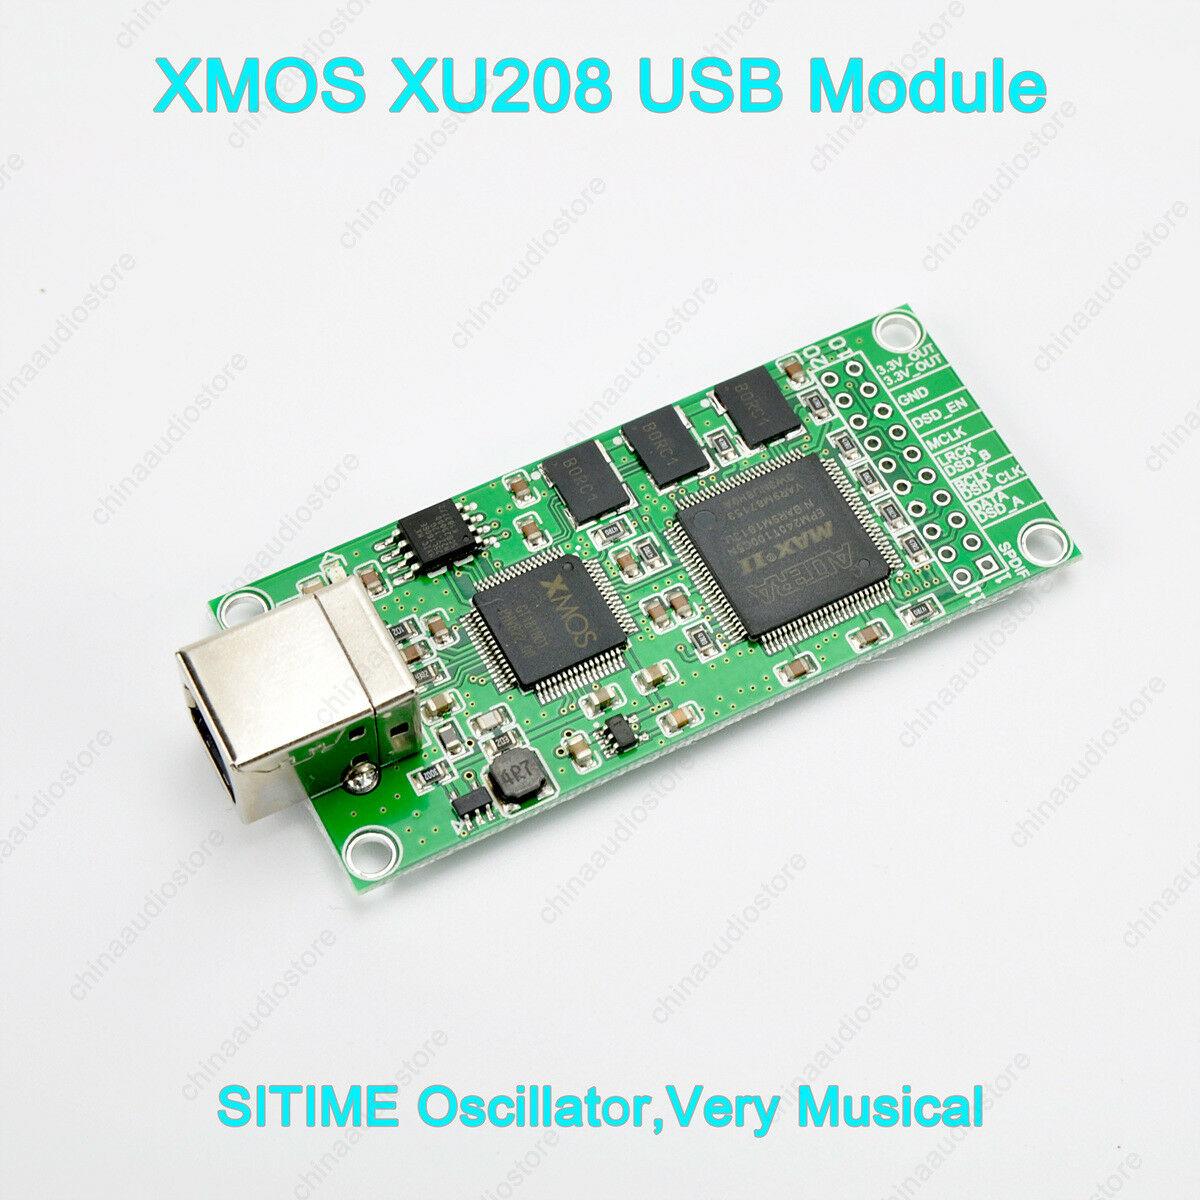 XMOS XU208 Digital USB interfaz USB a I2S para DAC DSD512 EE. UU. SITIME oscilador